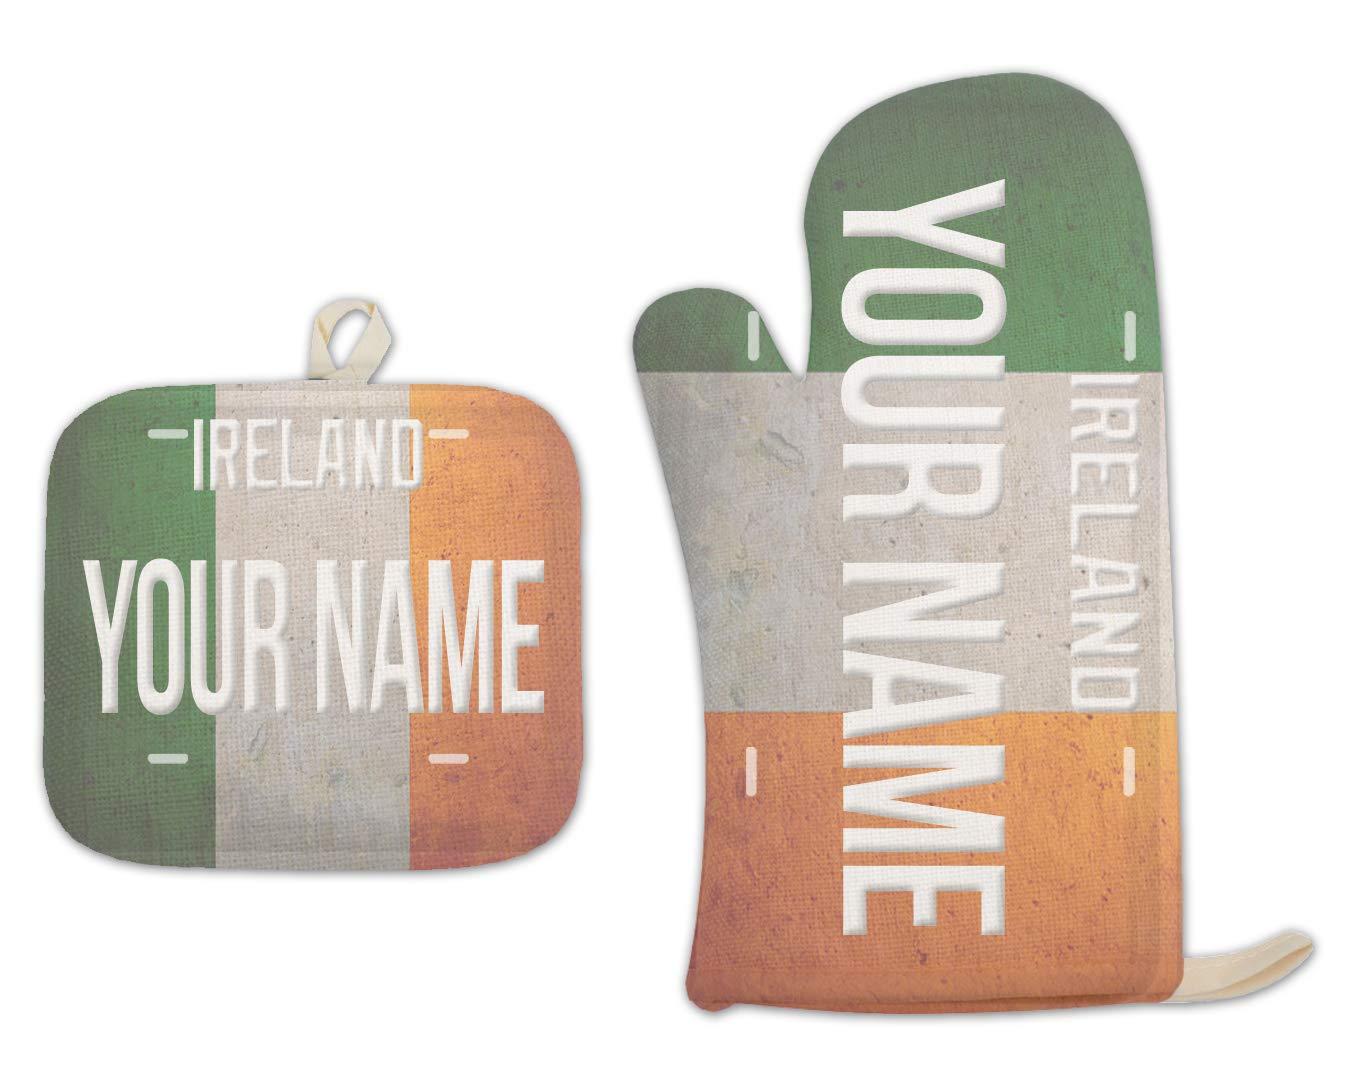 Bleu Reign BRGiftShop Personalized Custom Name License Ireland Plate Linen Oven Mitt and Potholder Set